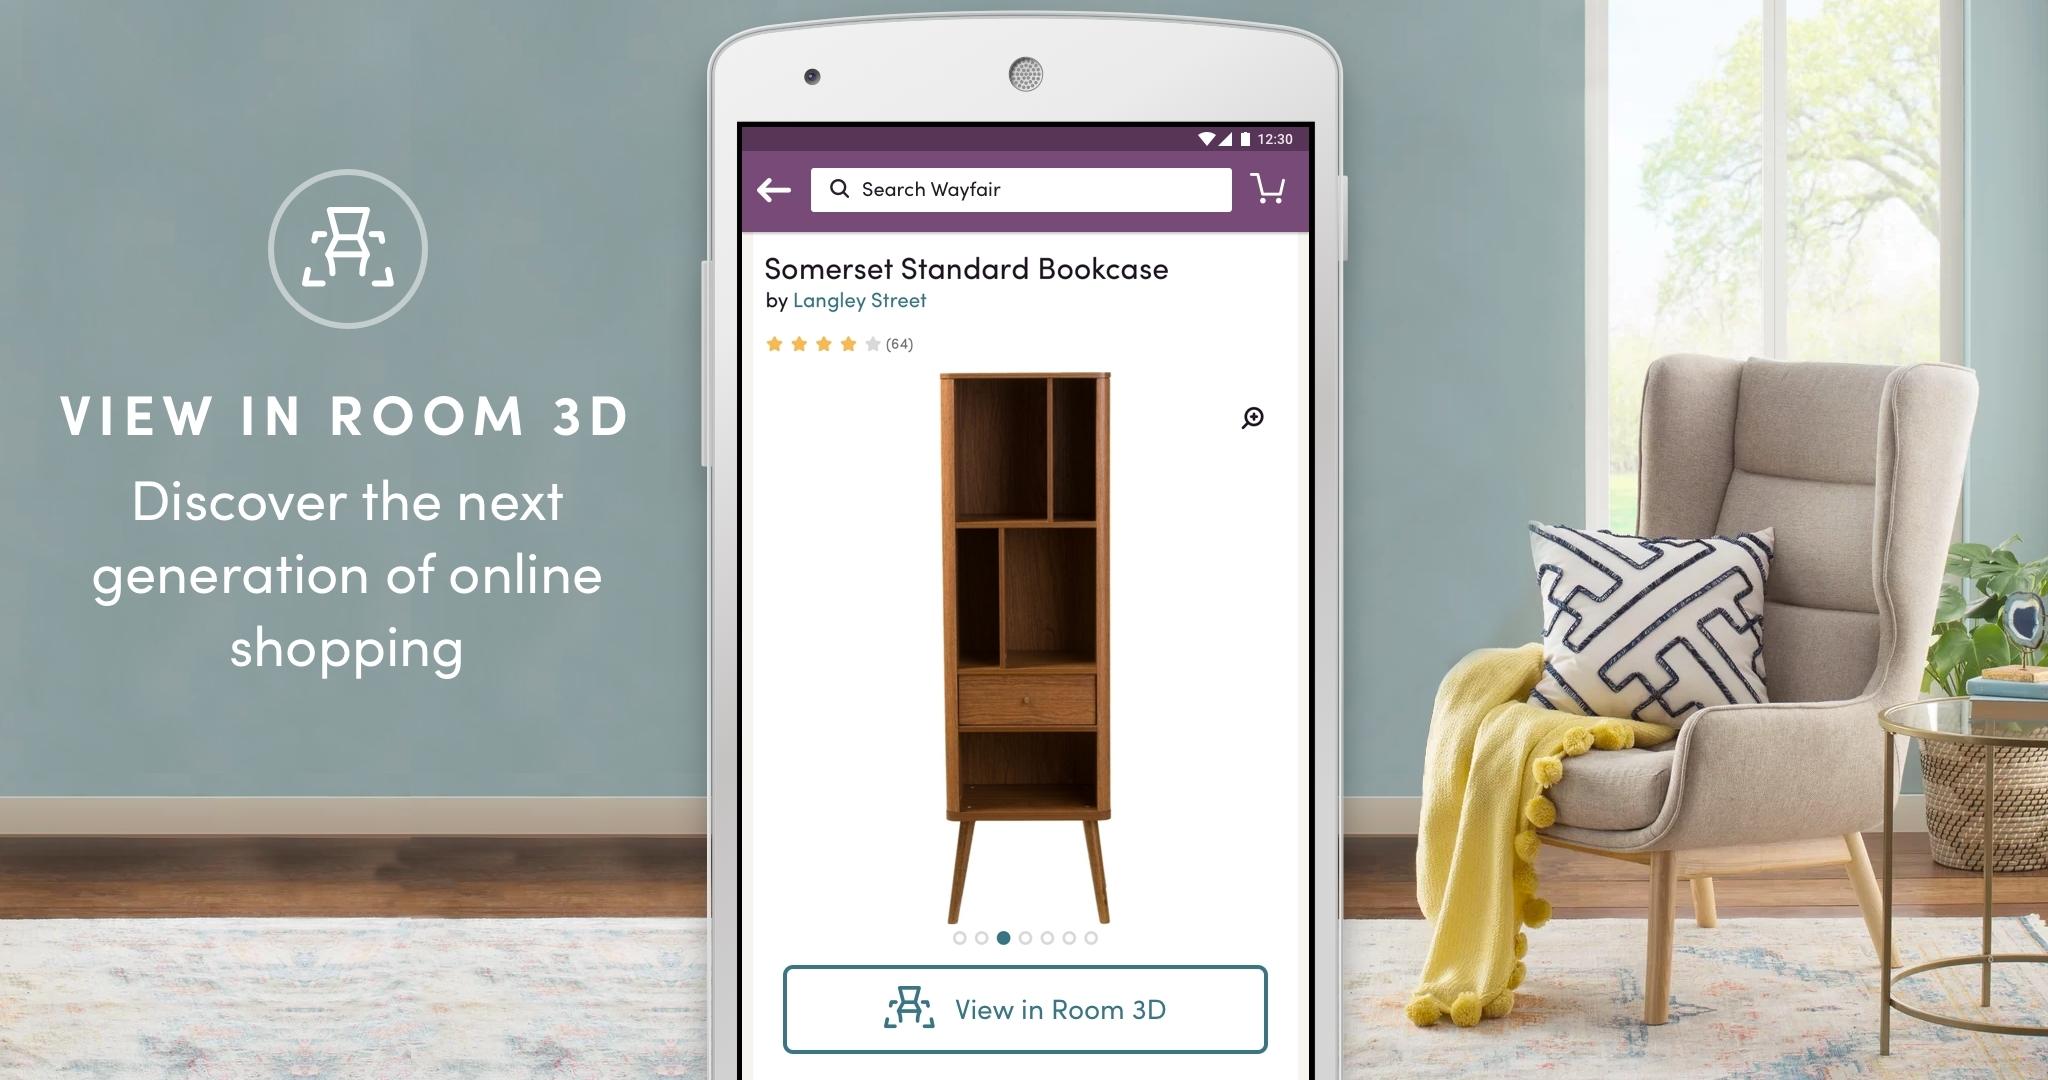 wayfair mobile shopping app can turn